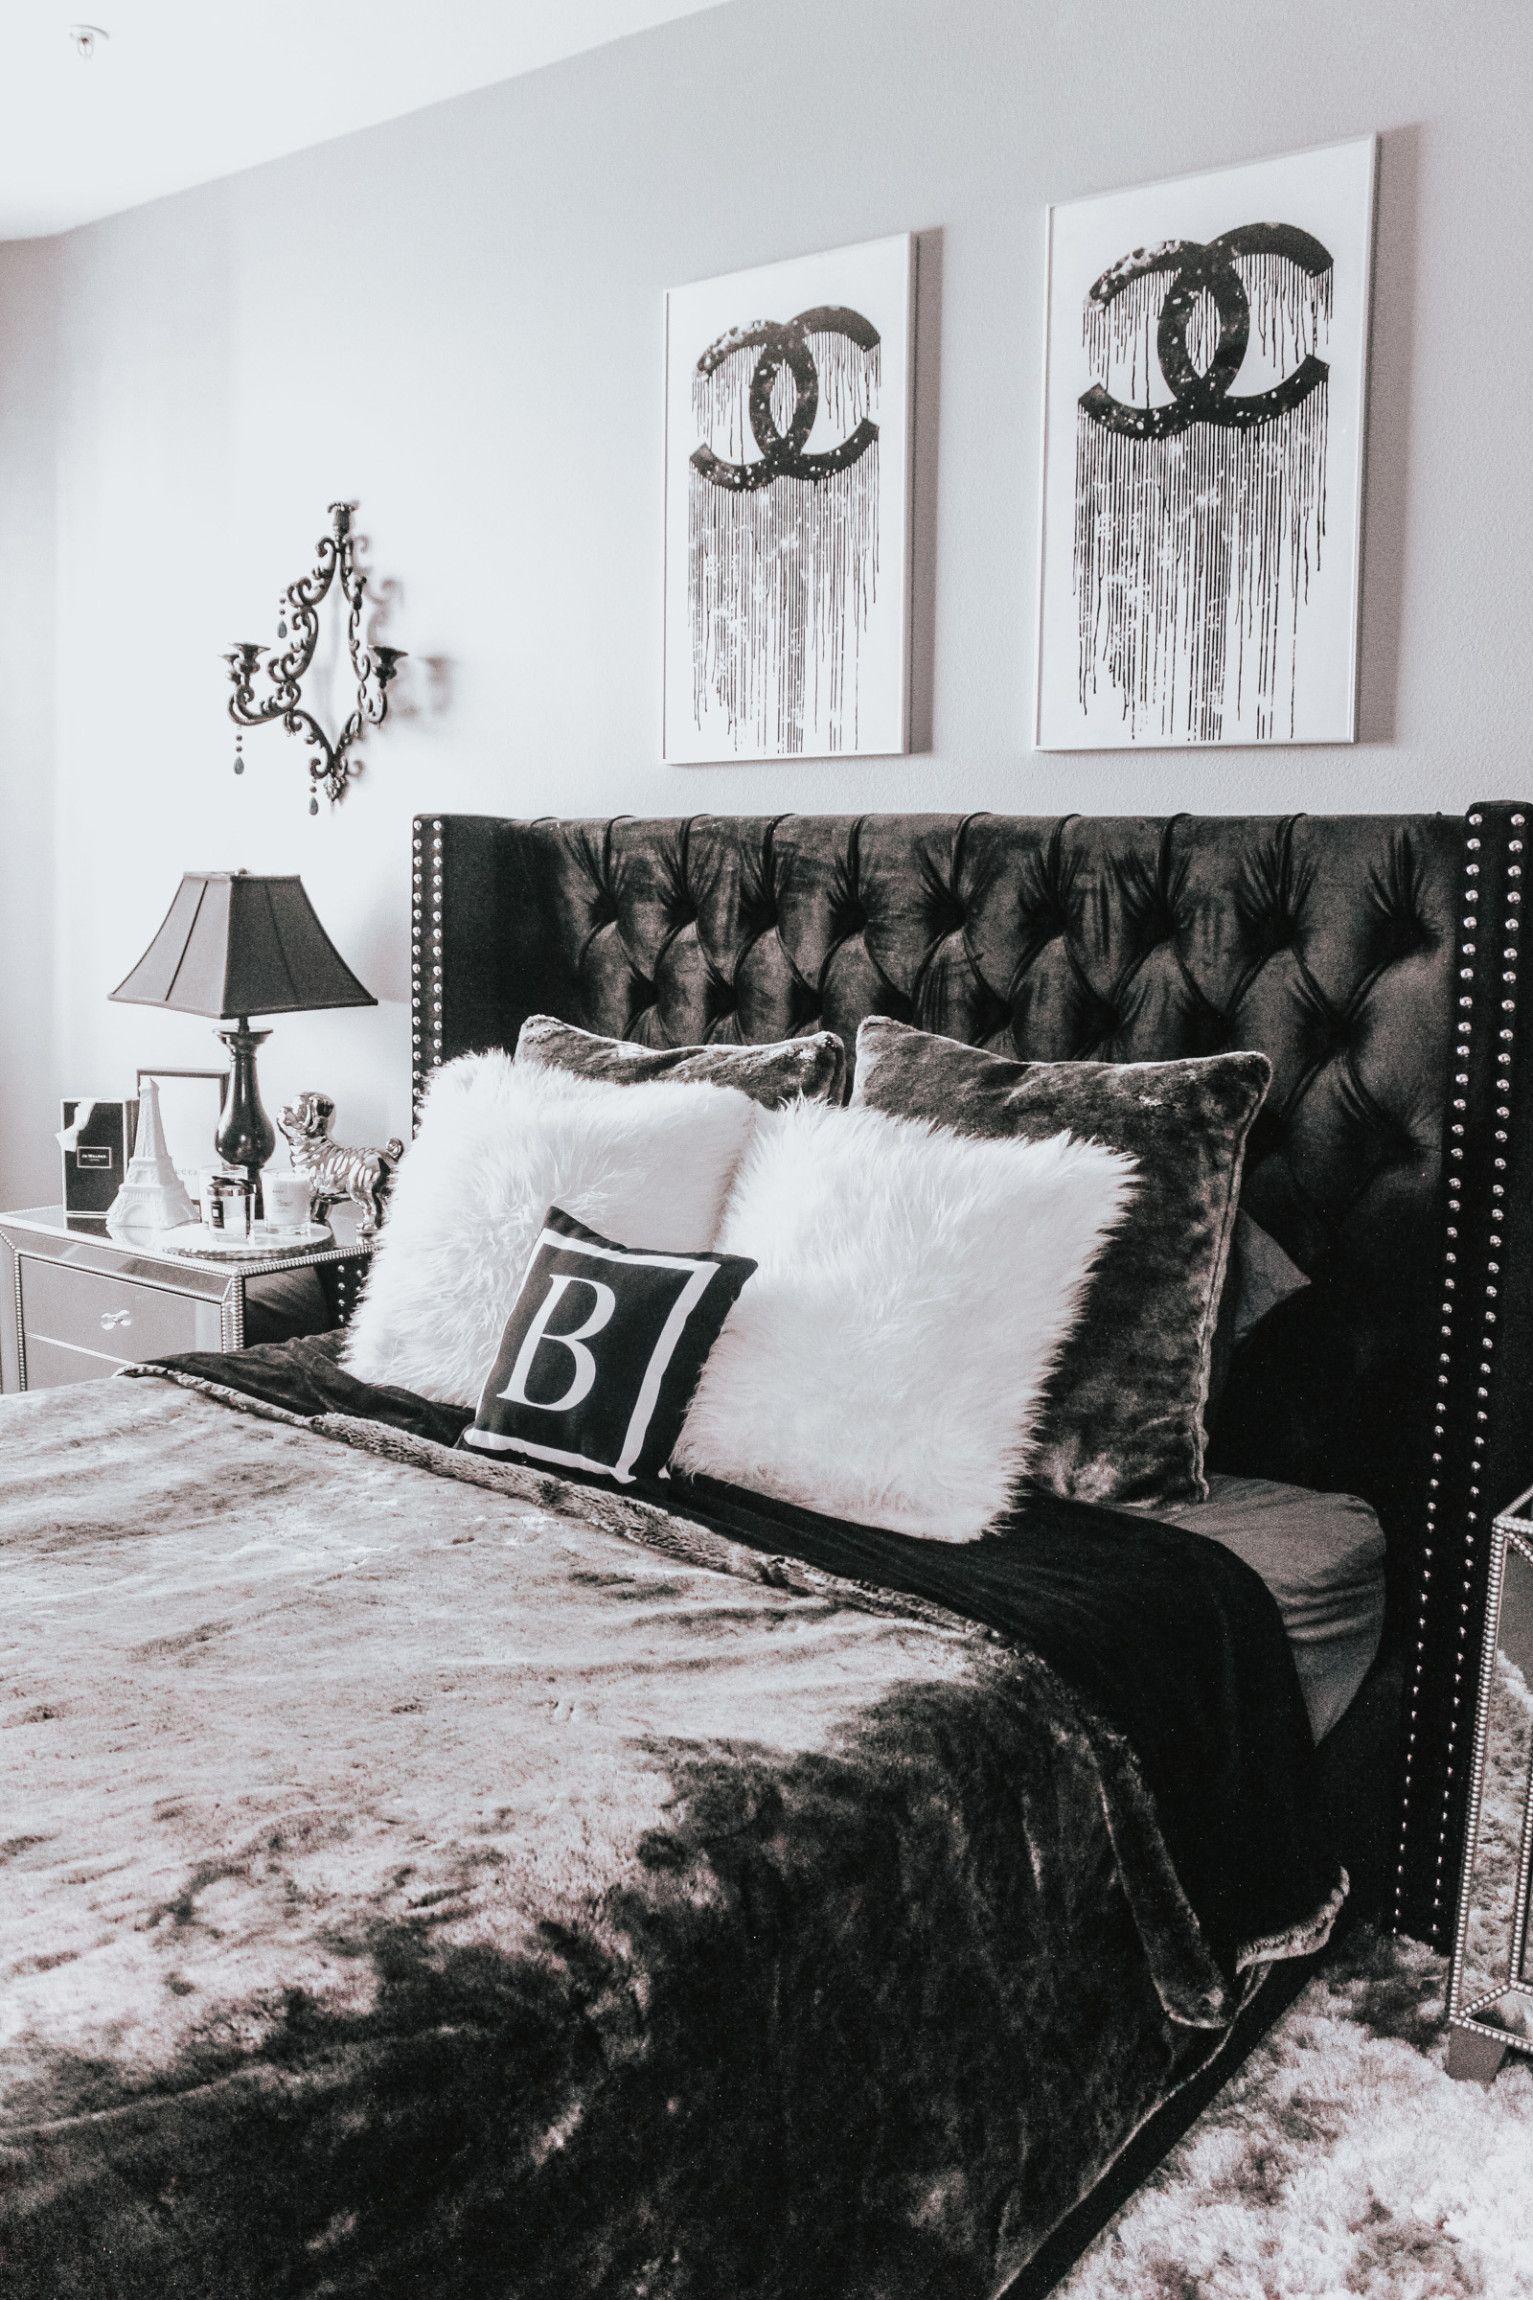 Bedroom Decor Updates White Bedroom Decor Black Bedroom Decor